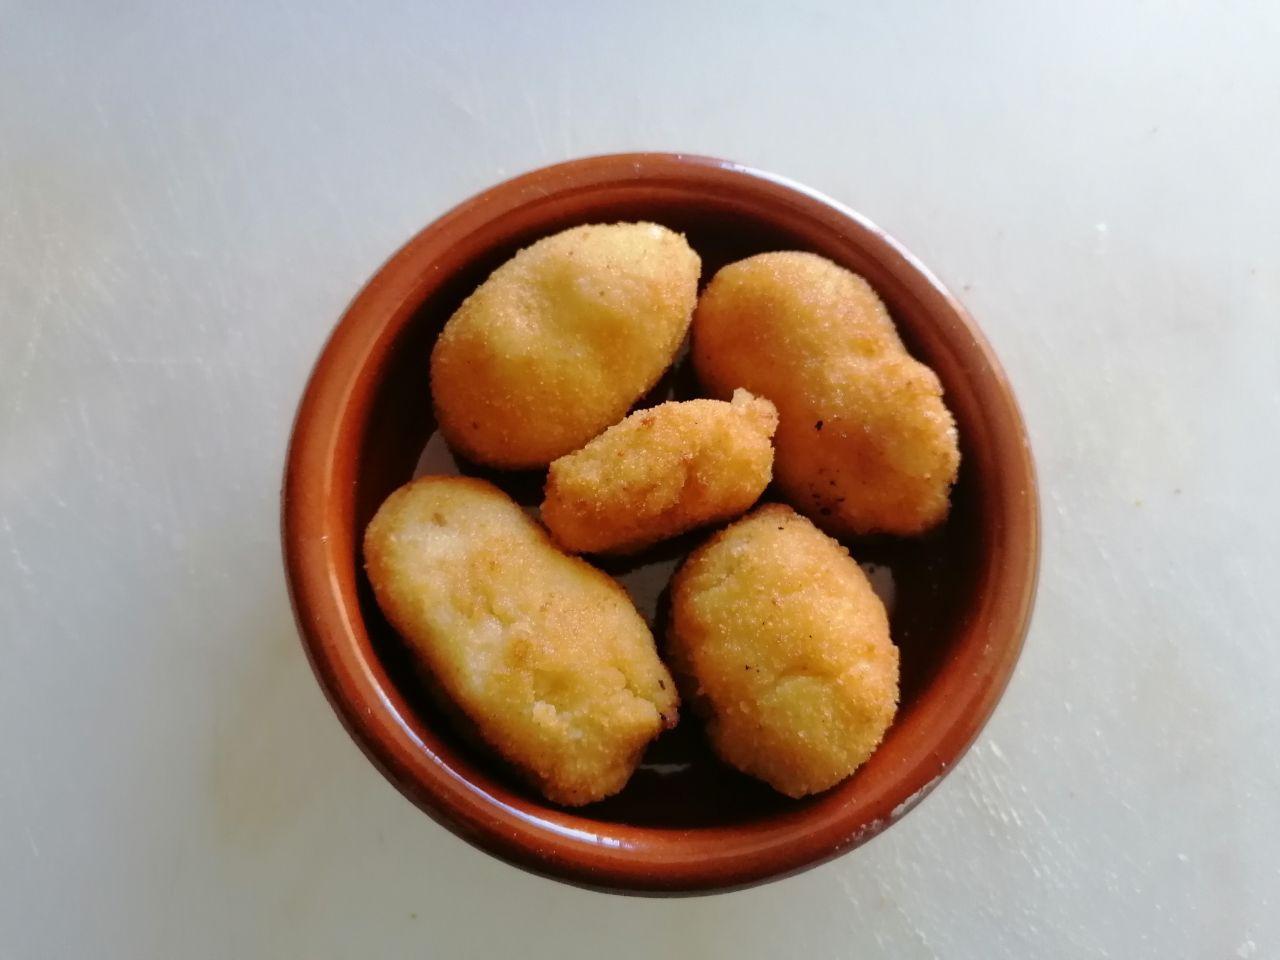 croquetas de jamon en mambo